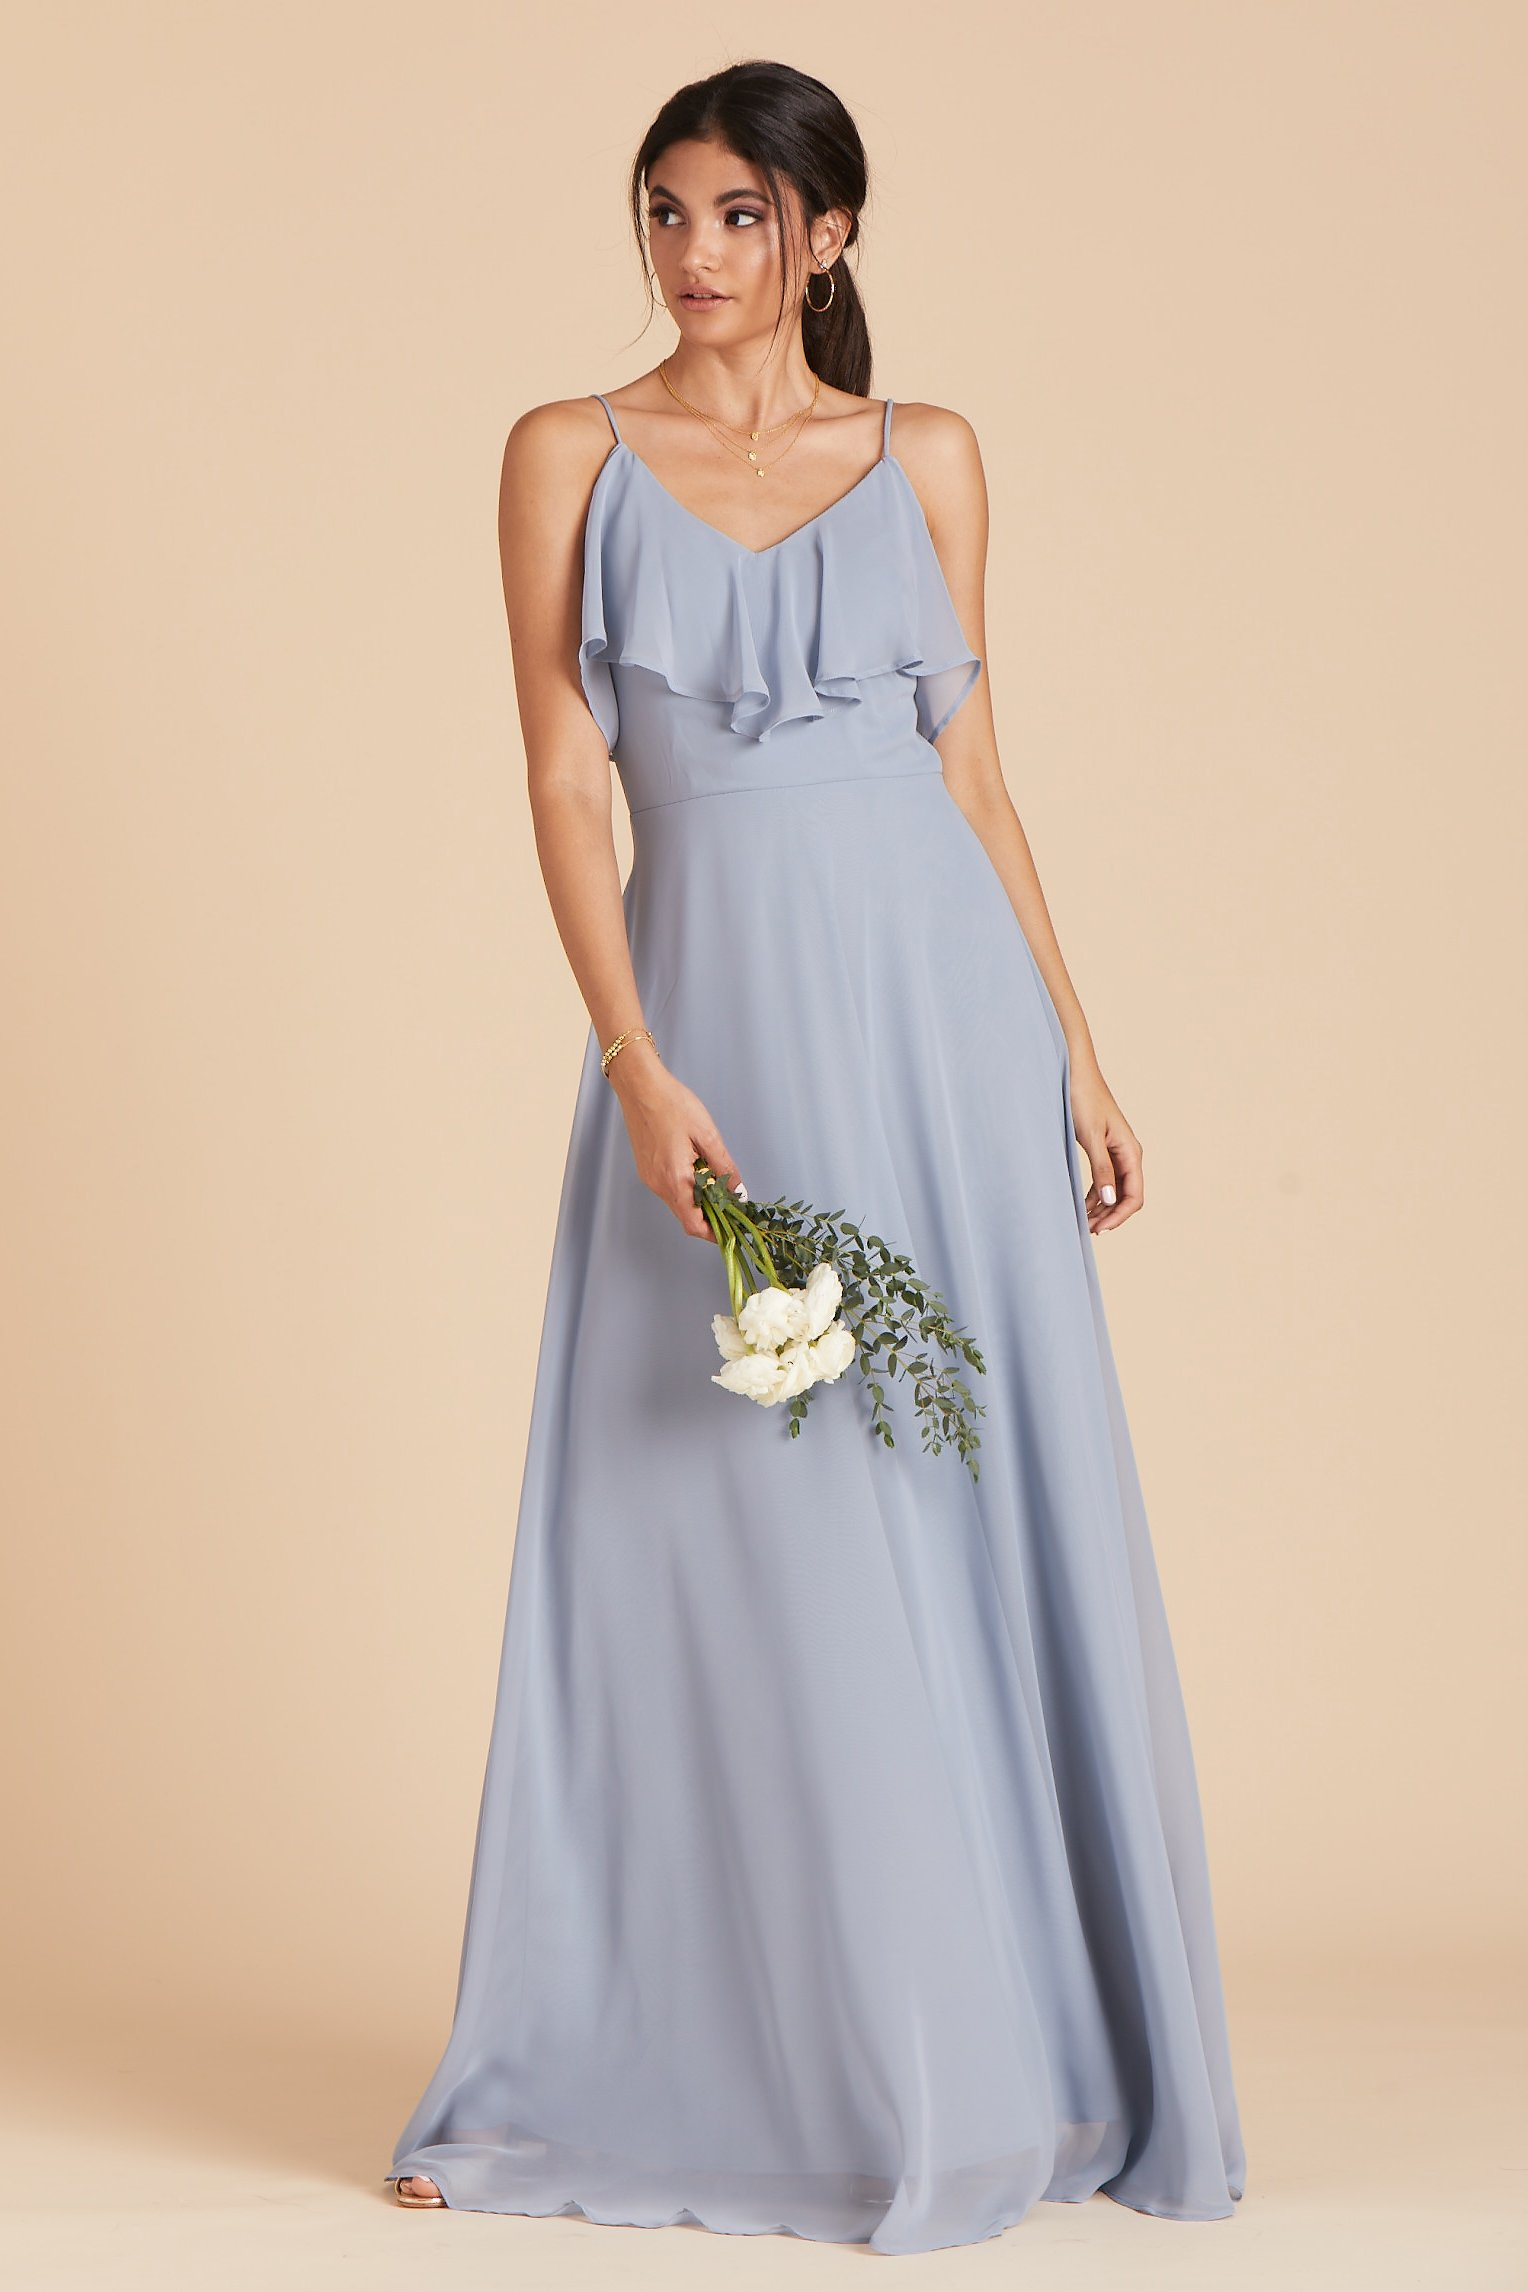 17+ Birdy grey jane dress ideas in 2021